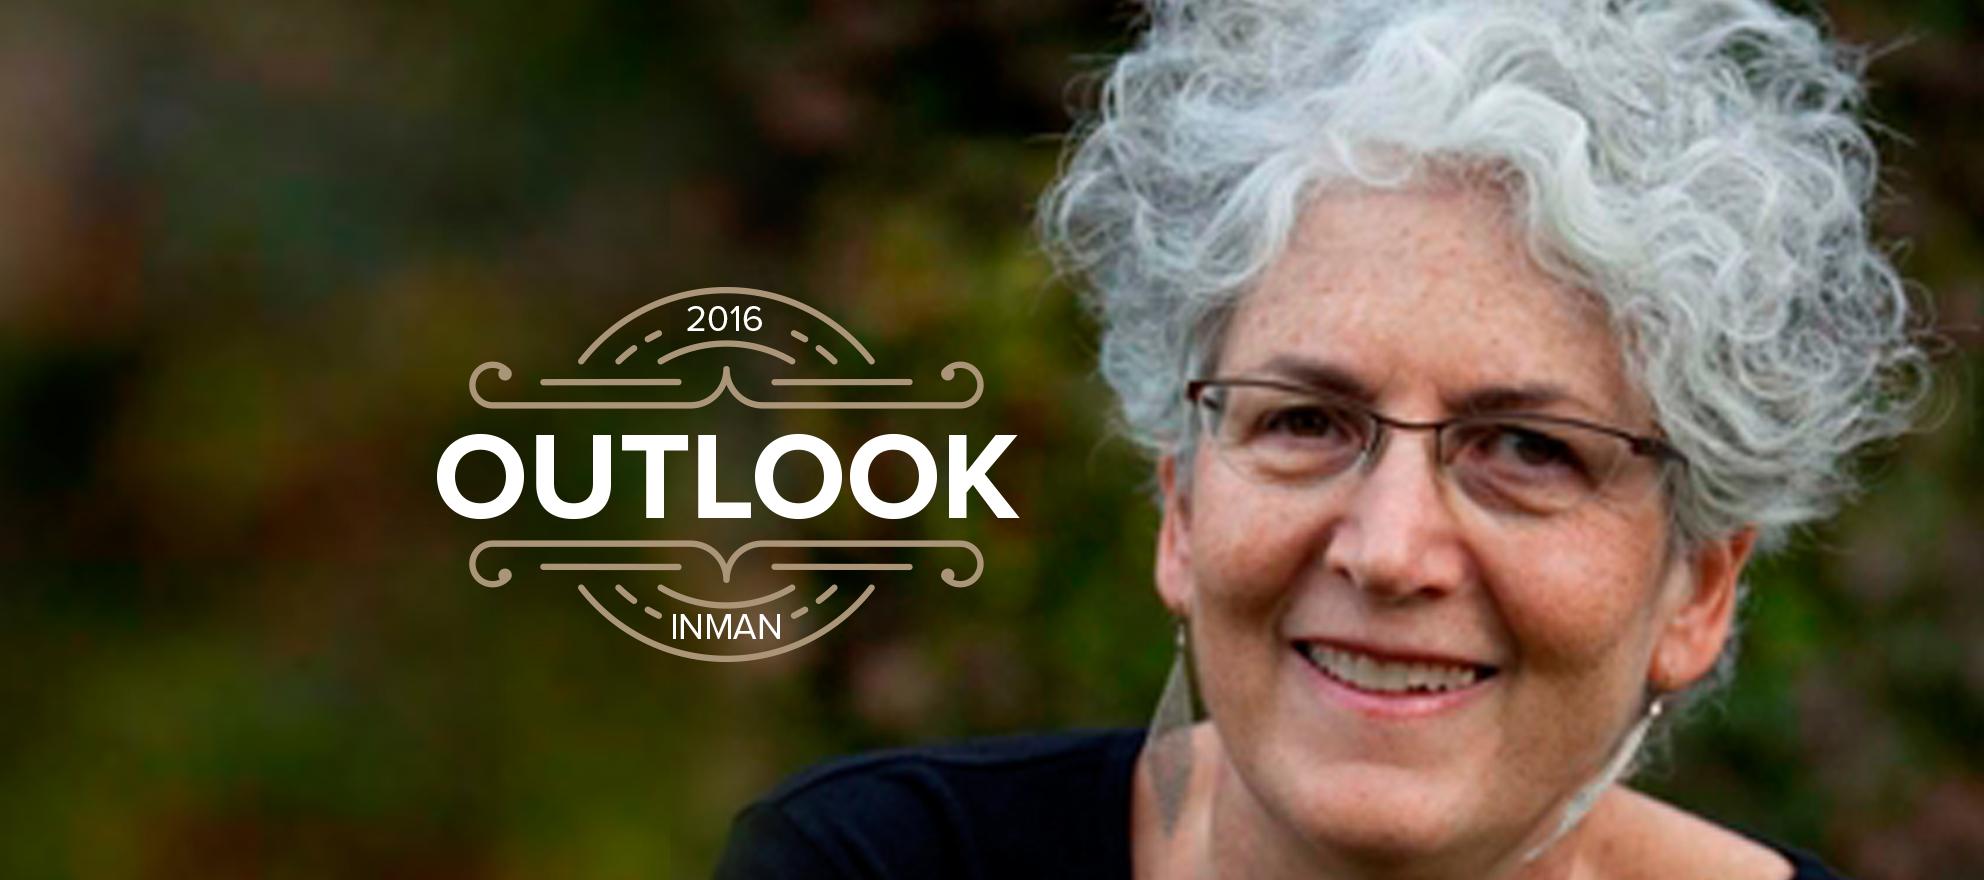 2016 outlook: Jennifer Alter Warden